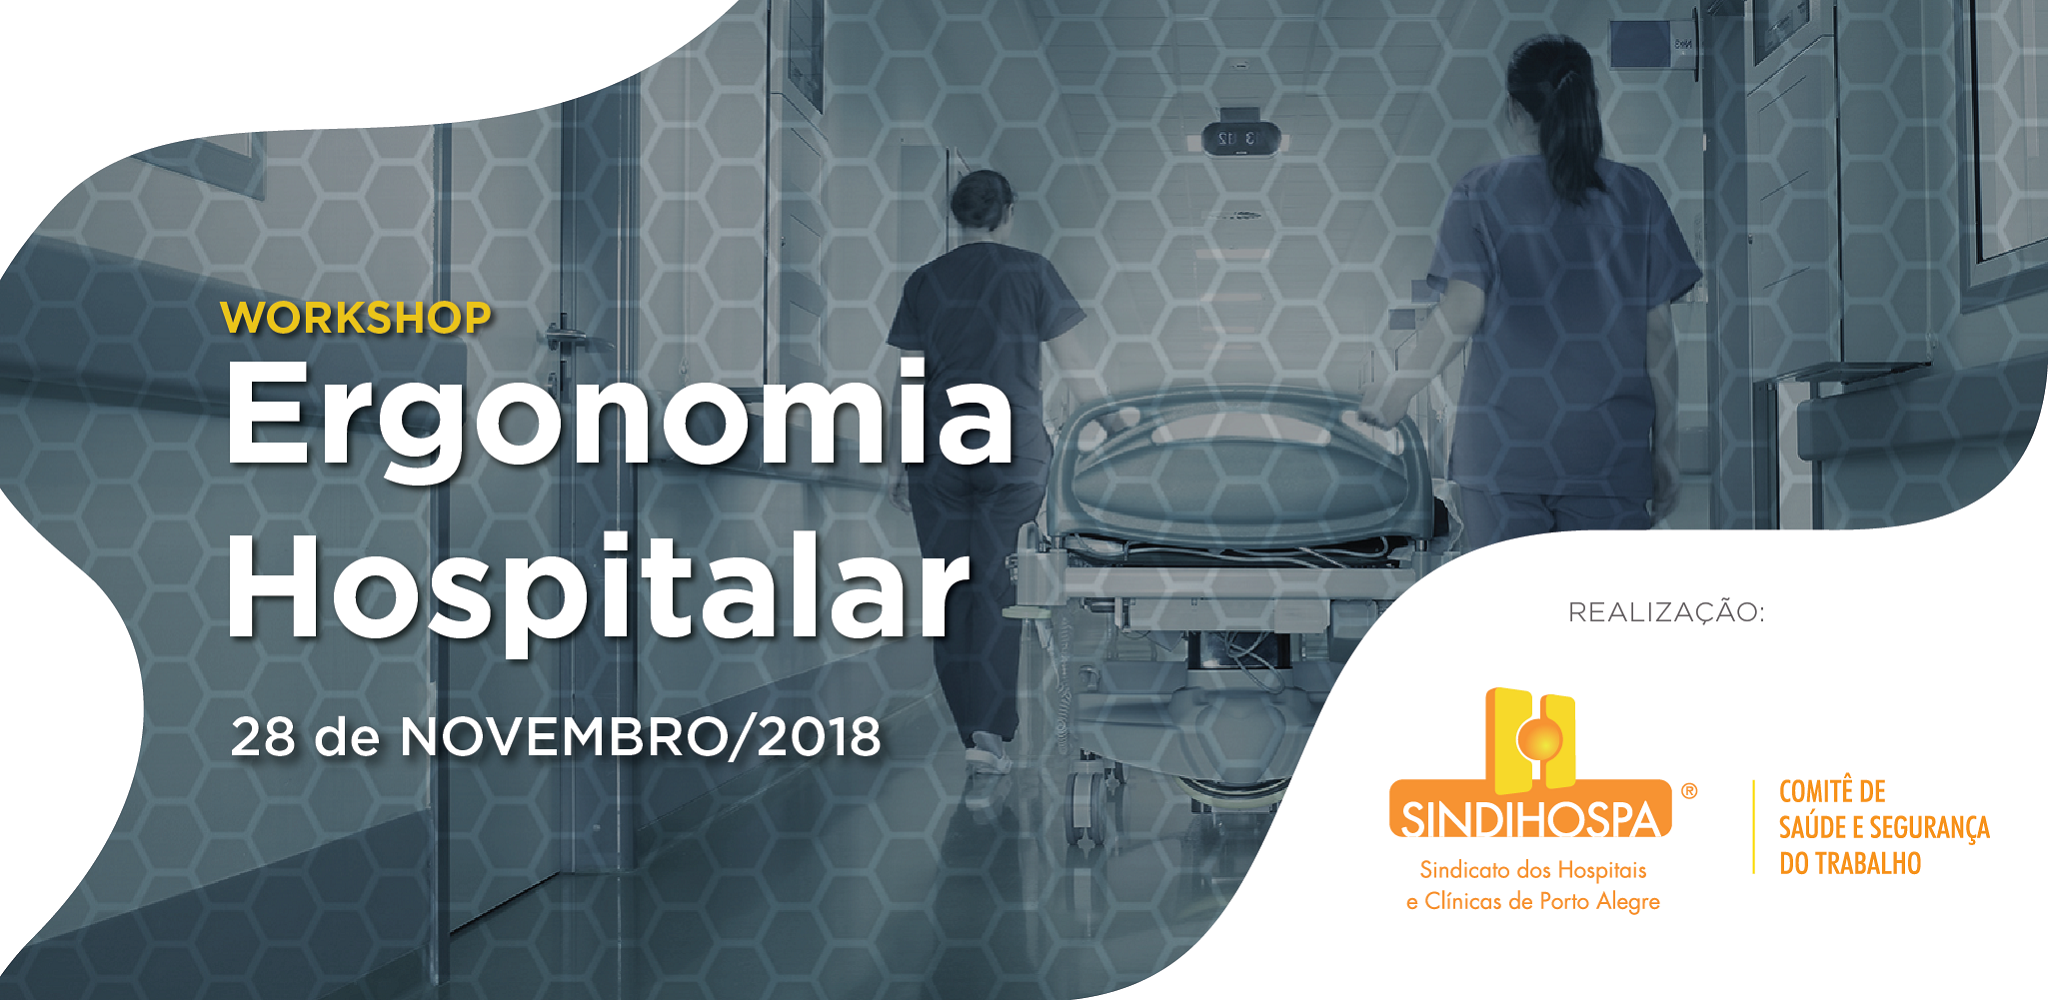 Workshop sobre Ergonomia Hospitalar